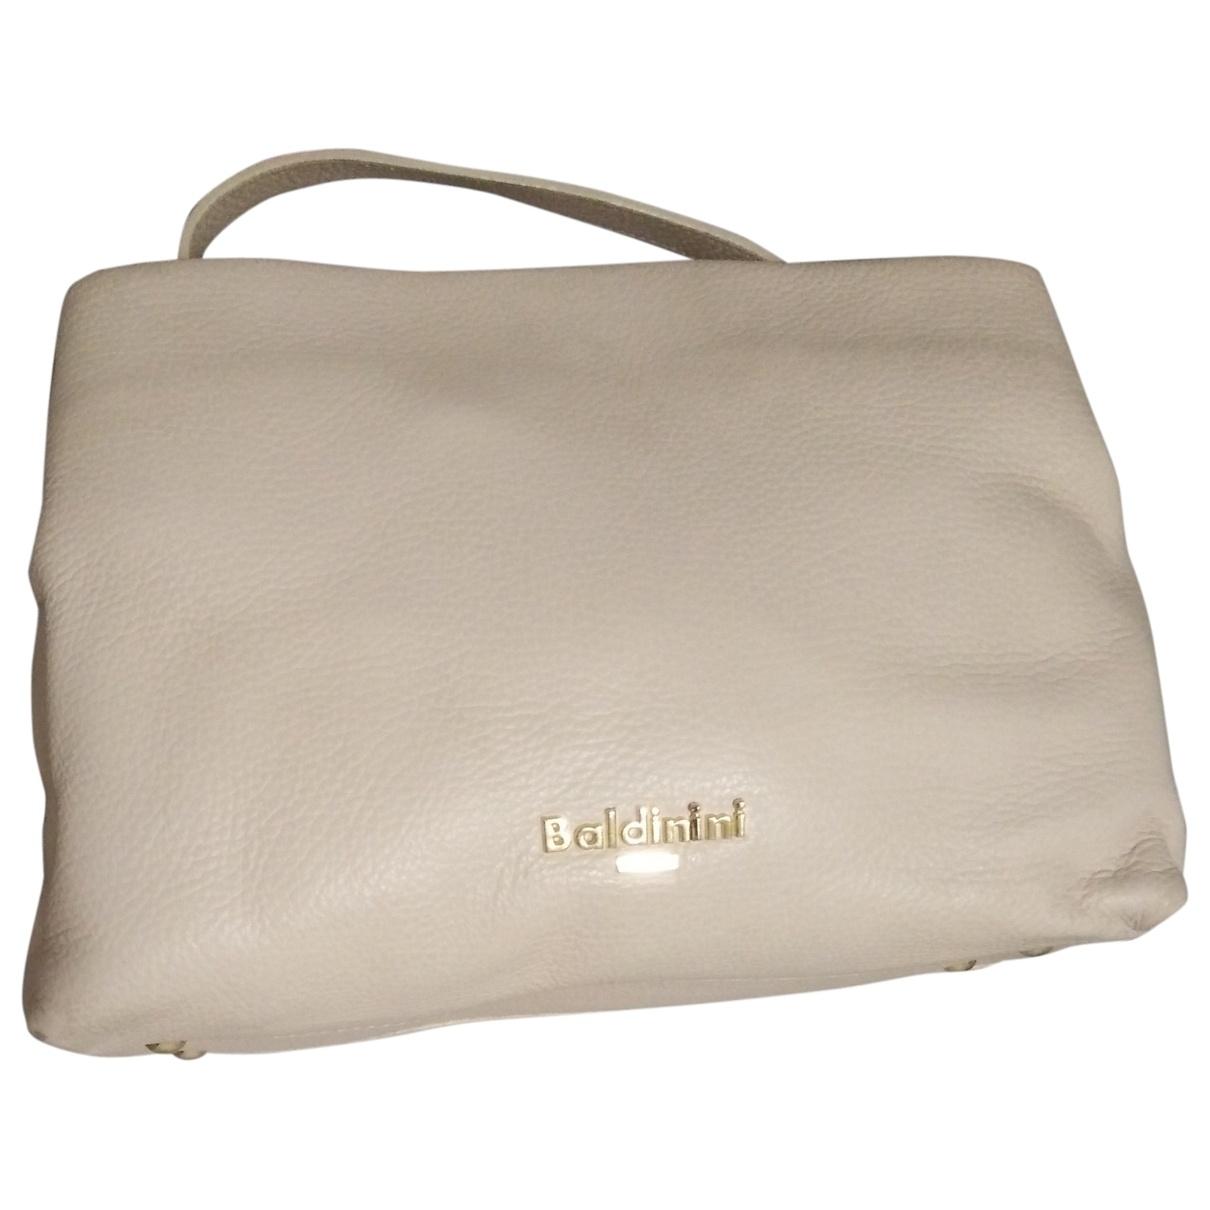 Baldinini \N Handtasche in  Beige Leder